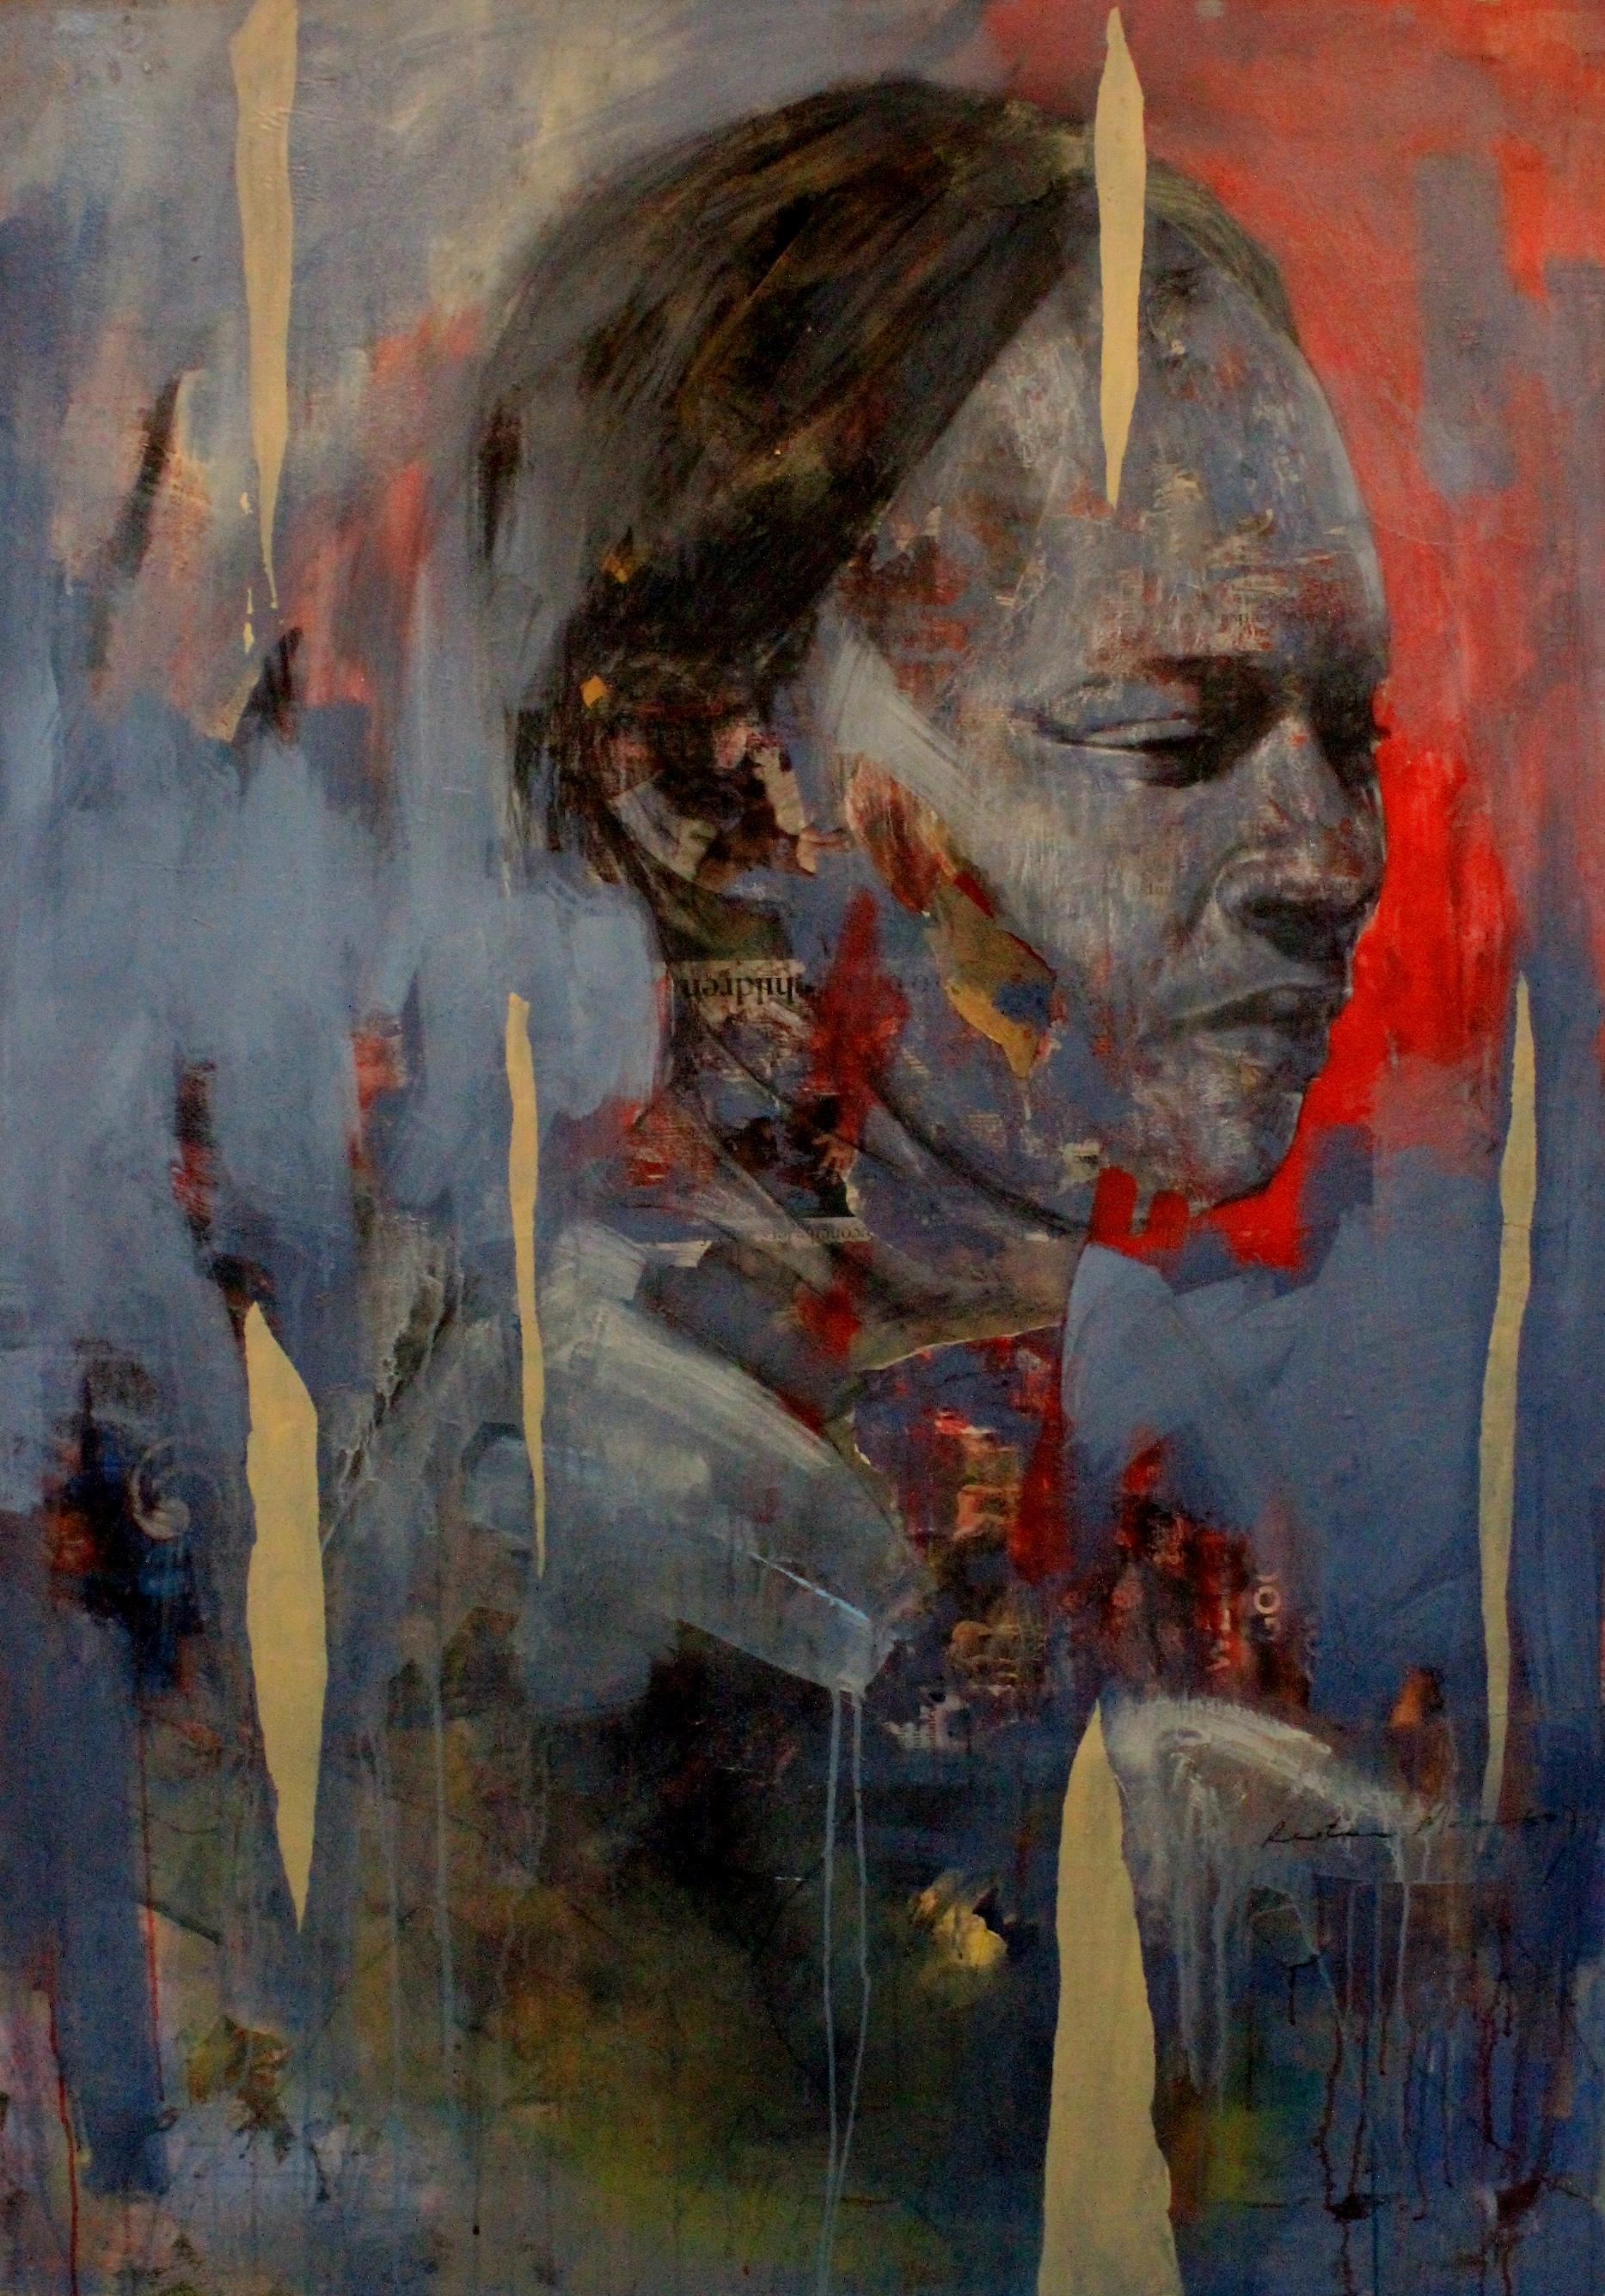 ' Sangoma'   Restone Maambo  Collage and Mixed Media on Canvas  1170 x 1660 x 40 mm  2018